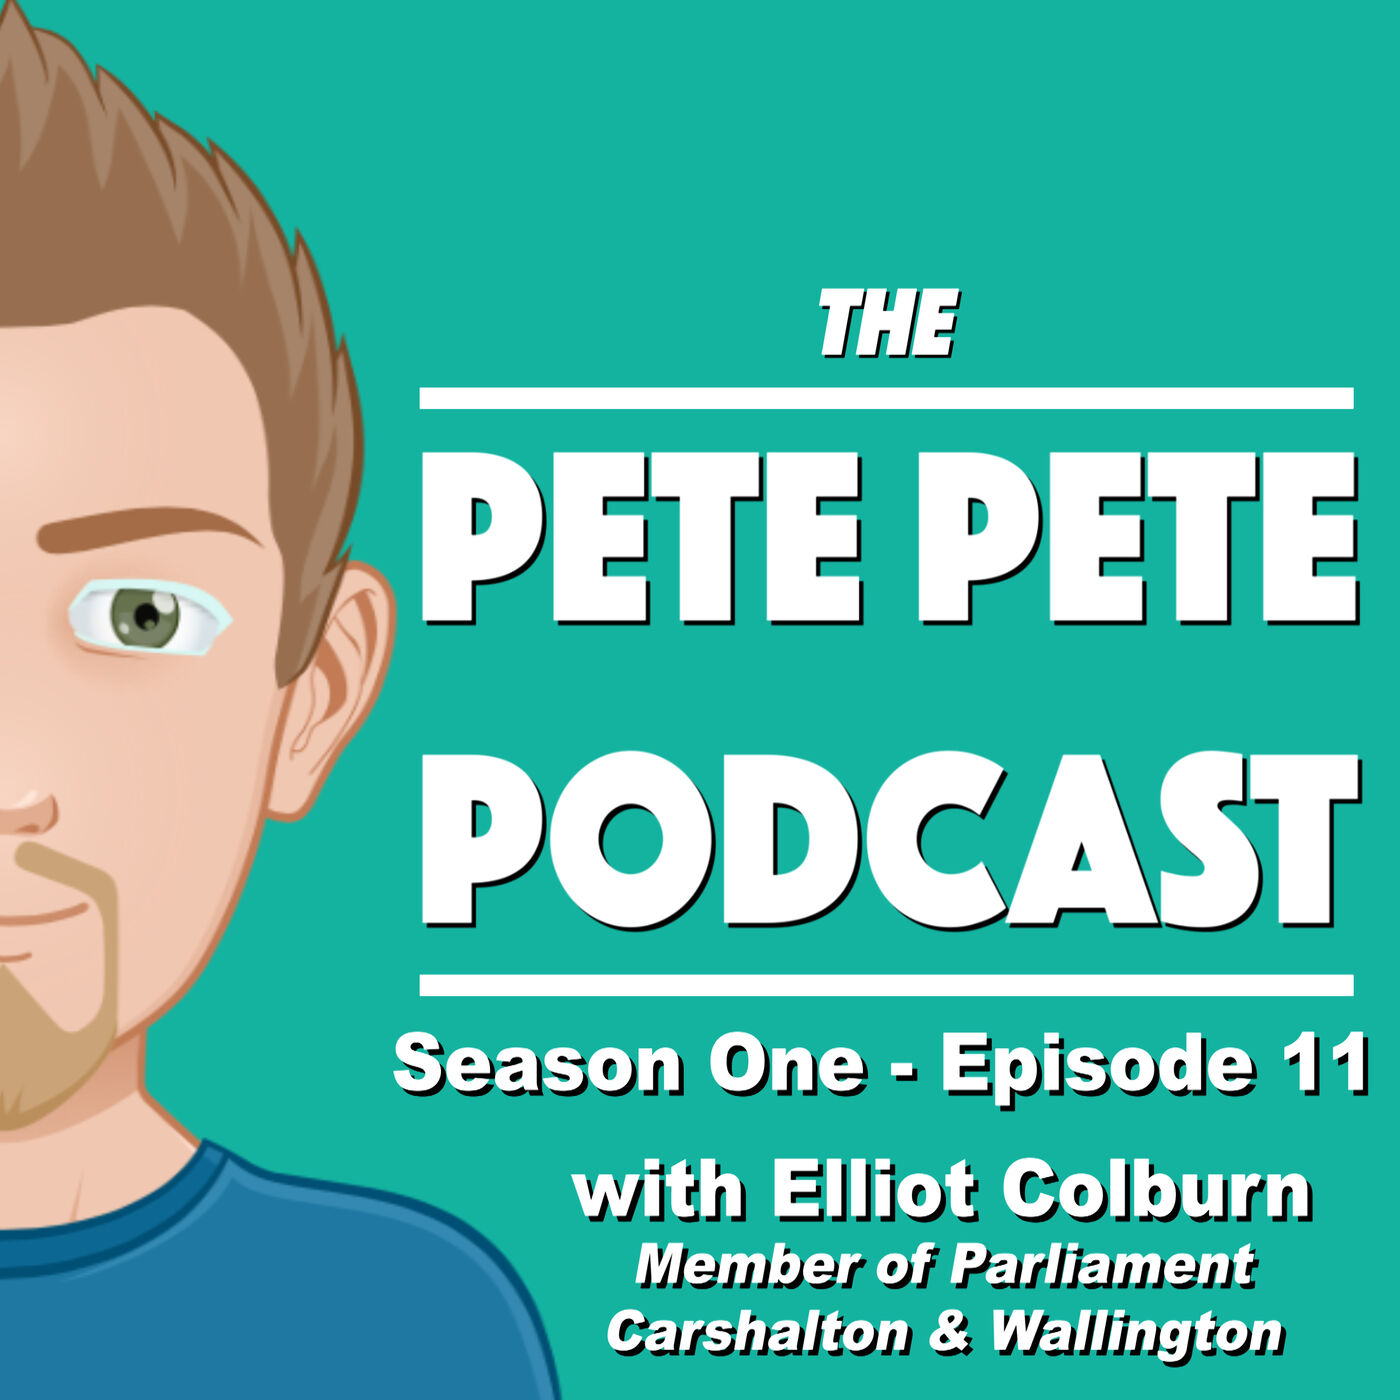 11. Pete Pete Podcast with Elliot Colburn (MP for Carshalton & Wallington)